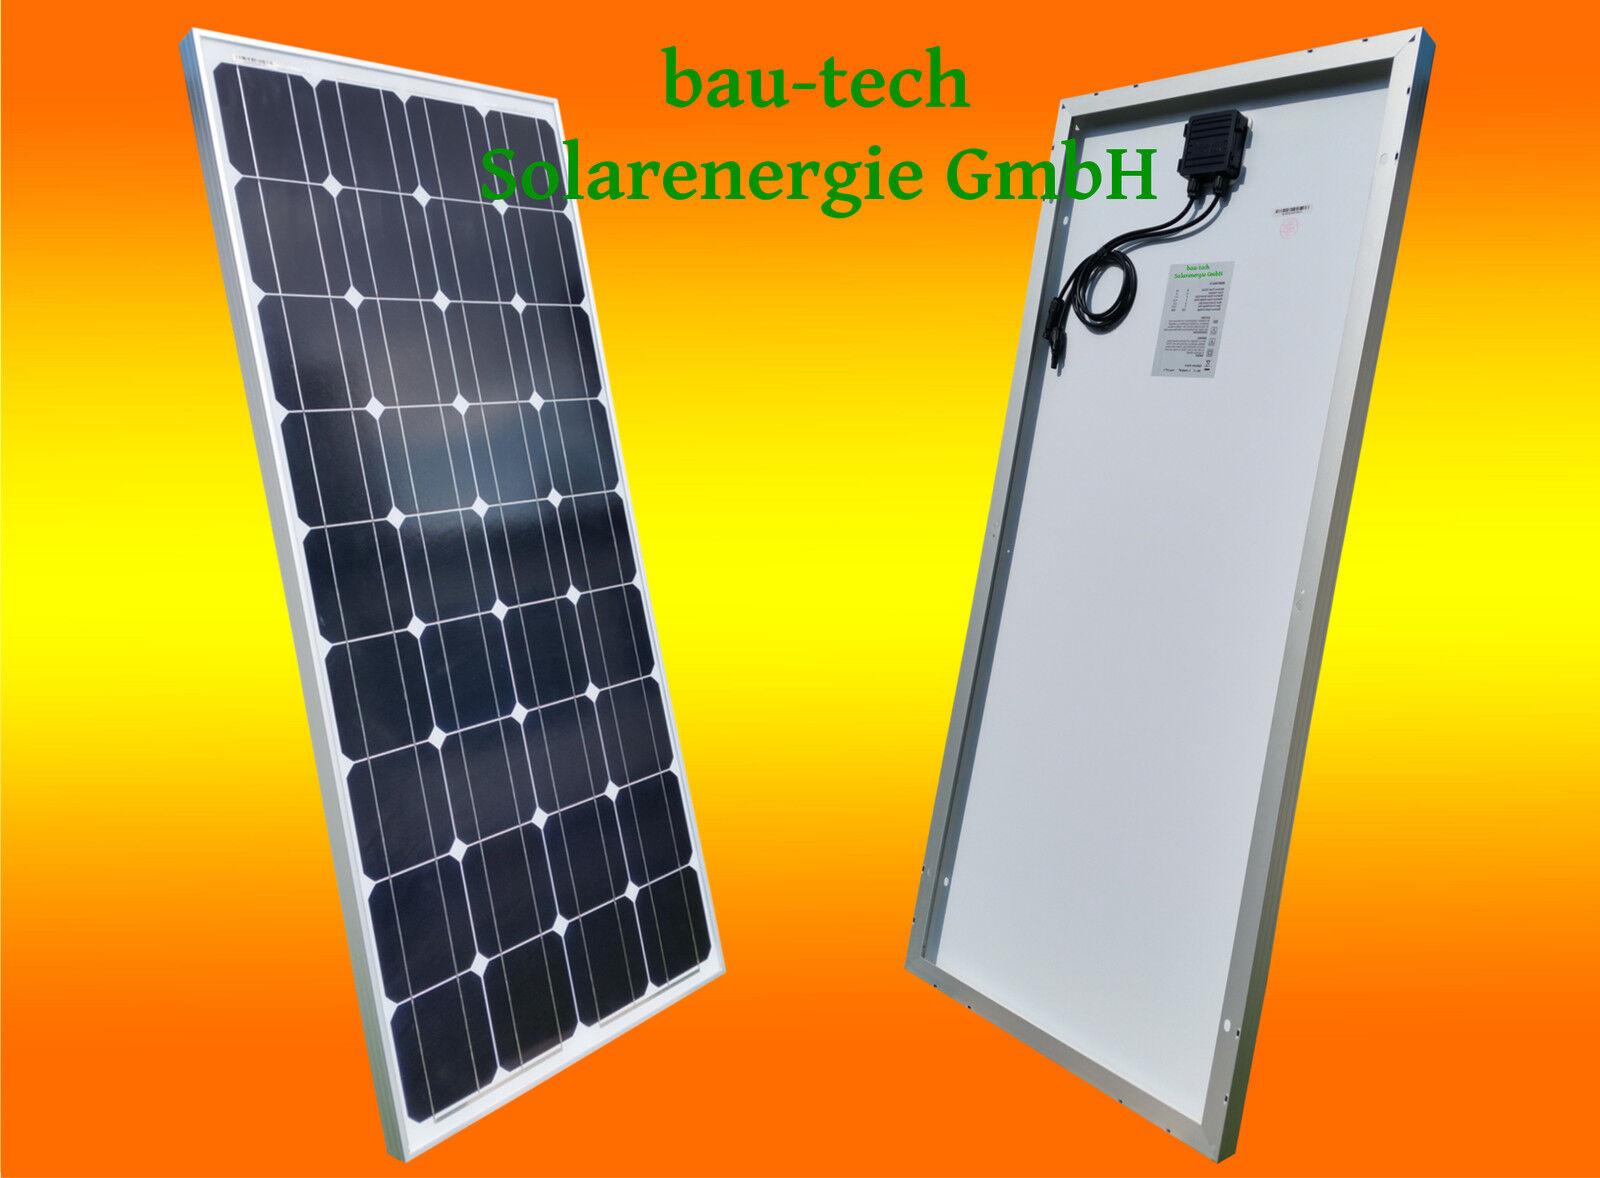 100W 100Watt Solarmodul 12V Monokristallin Solarpanel Camping Wohnmobil Caravan